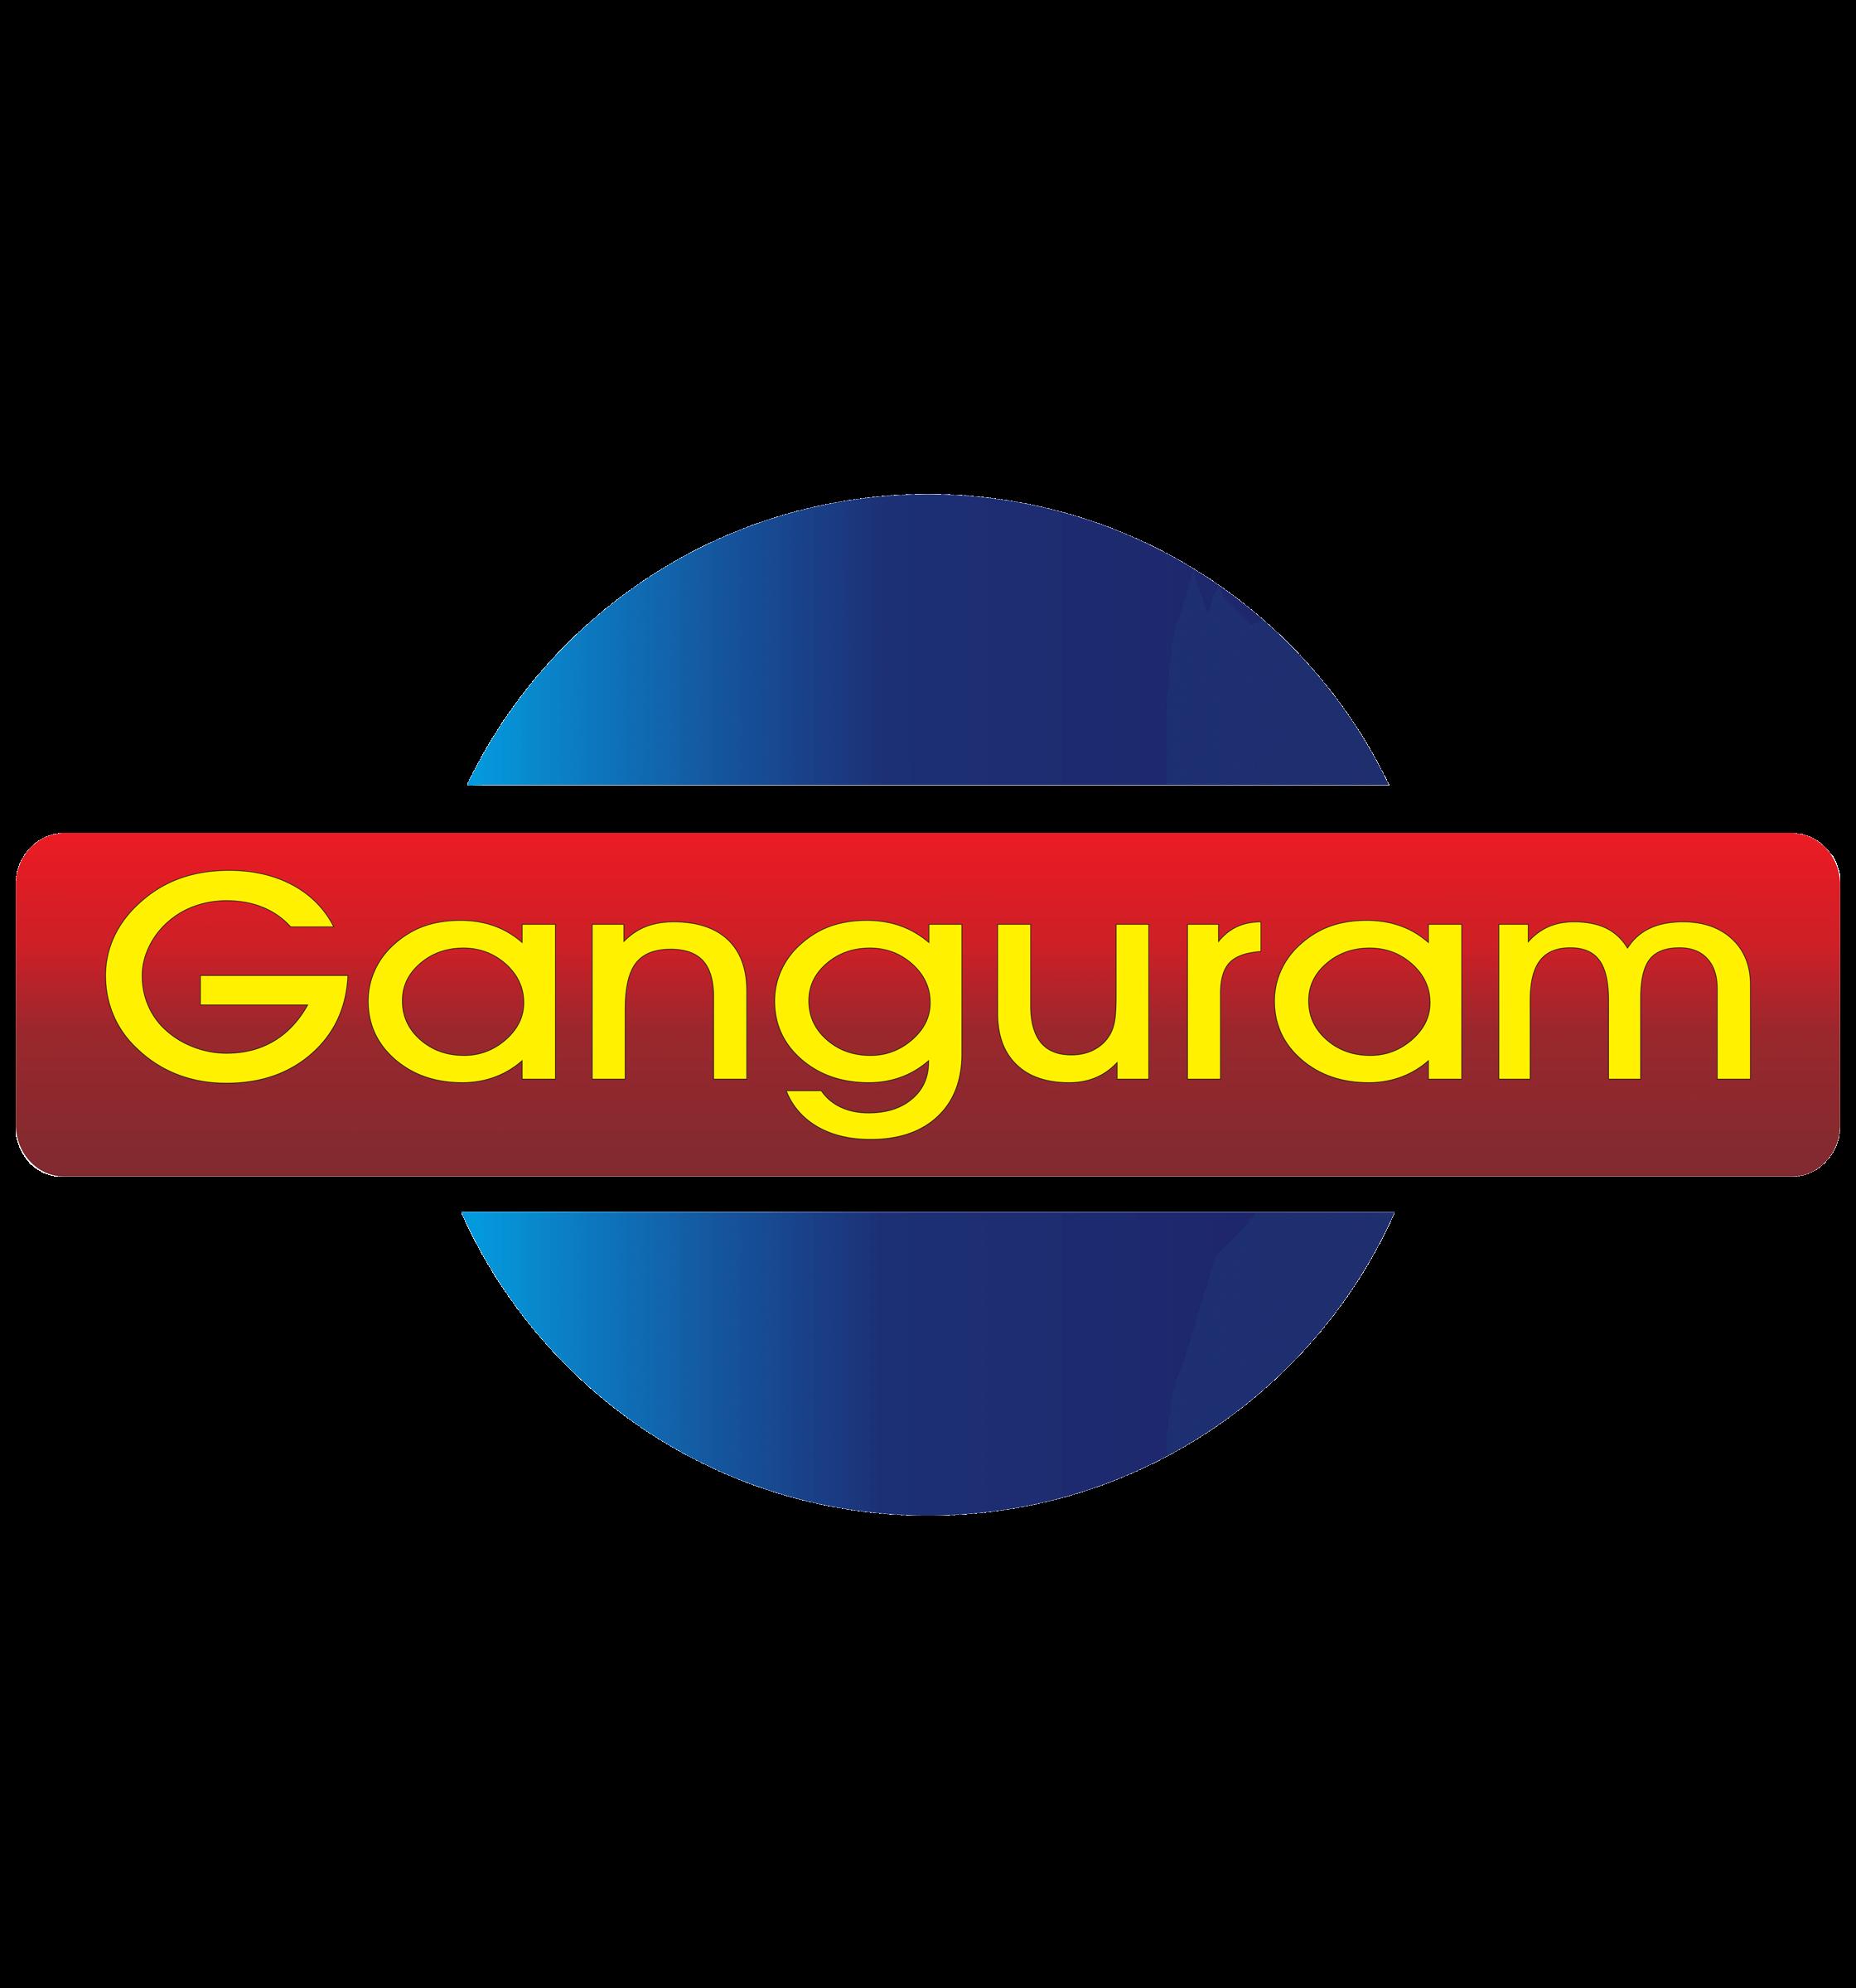 Ganguram